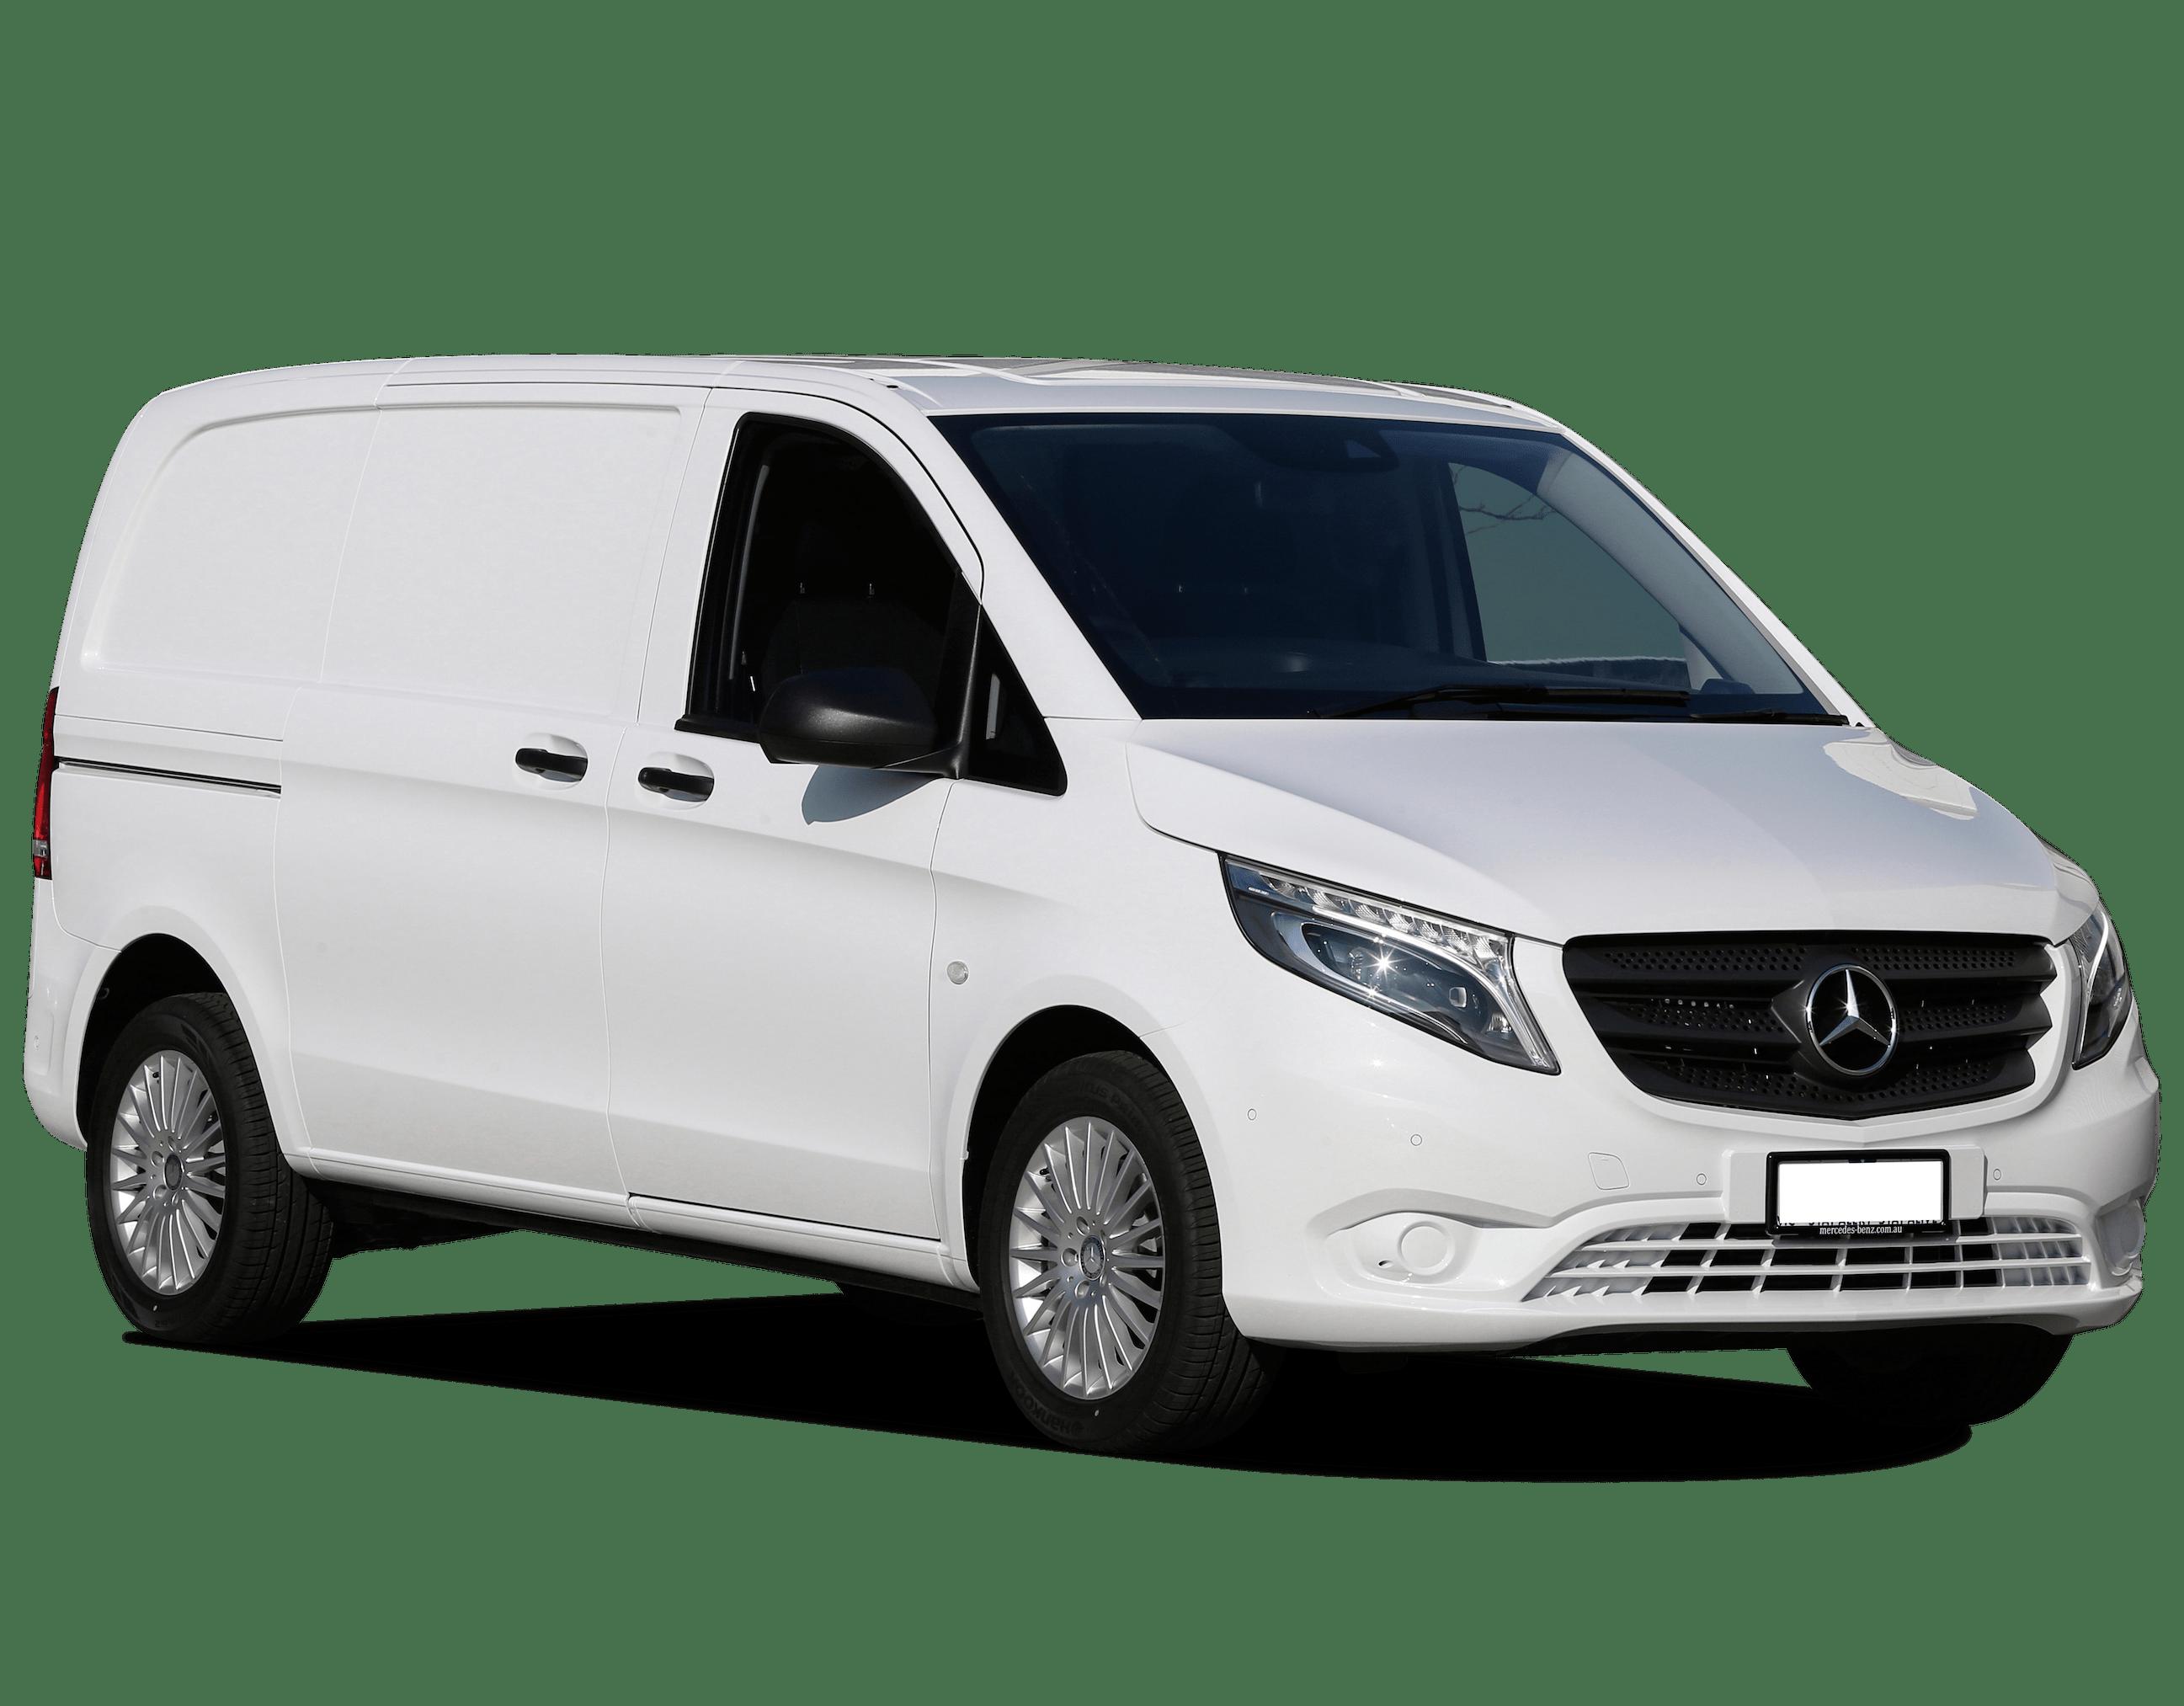 Mercedes Benz Vito Reviews Carsguide